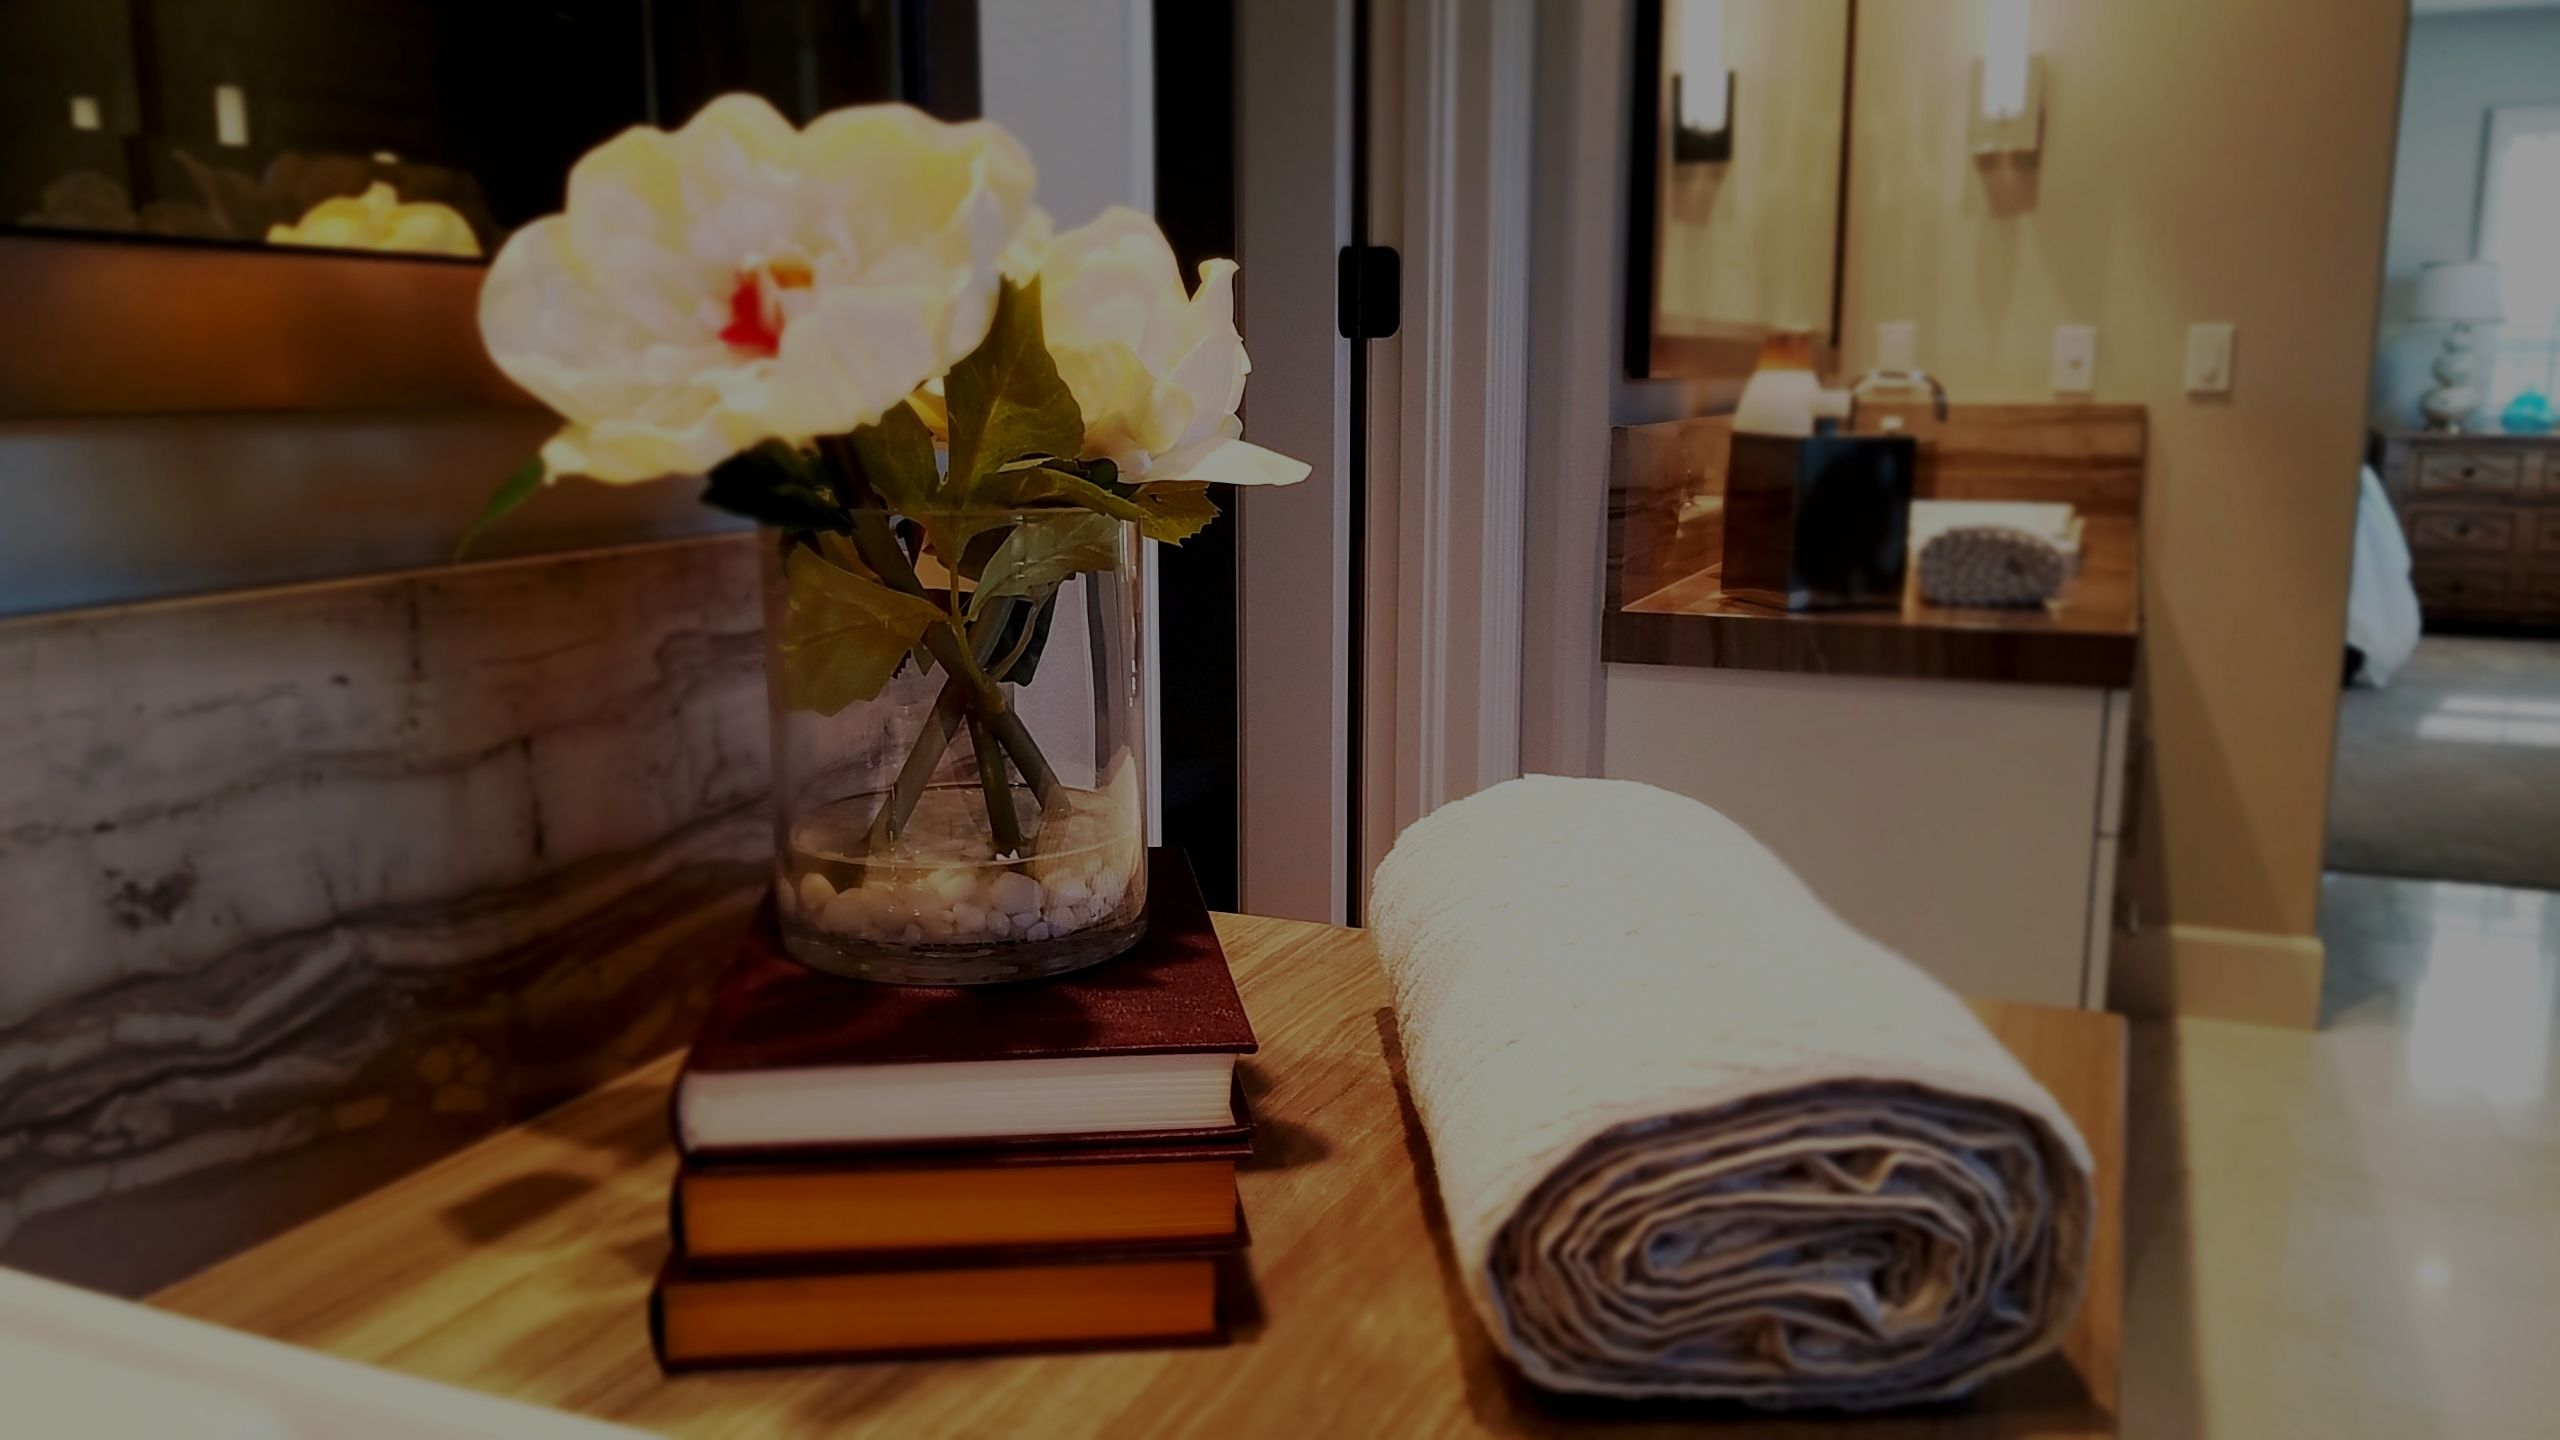 Heated Towel Rack Simple Life Pleasure | Houzz Bruce Clark Orange County Real Estate